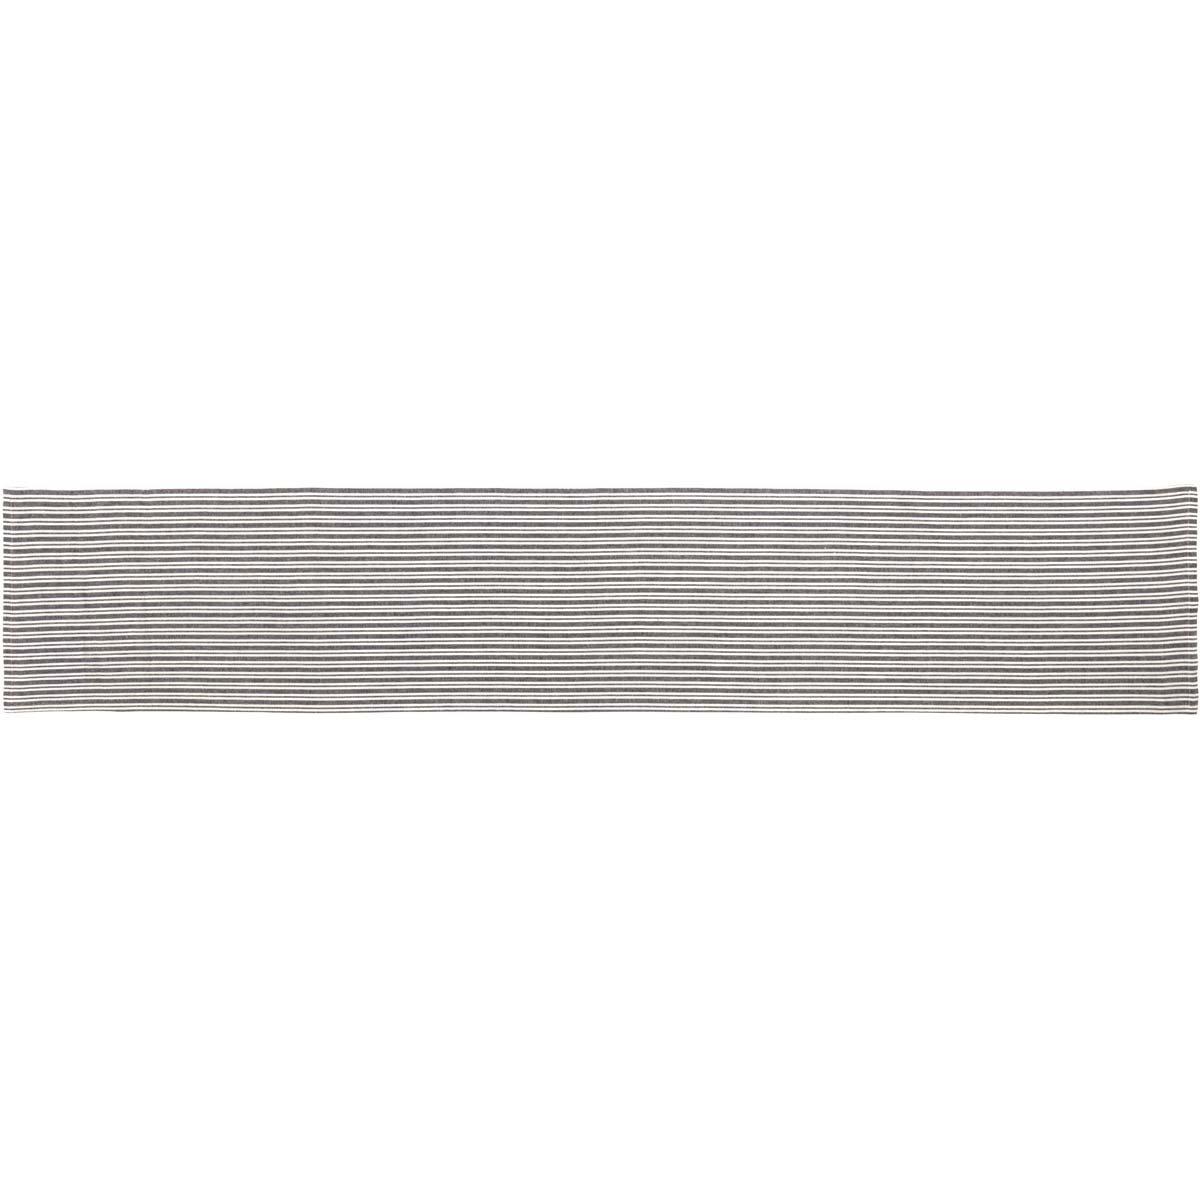 6845fbdf5 13x72 33339 Accessories VHC Brands Farmhouse Tabletop & Kitchen-Classic  Stripe Black Runner